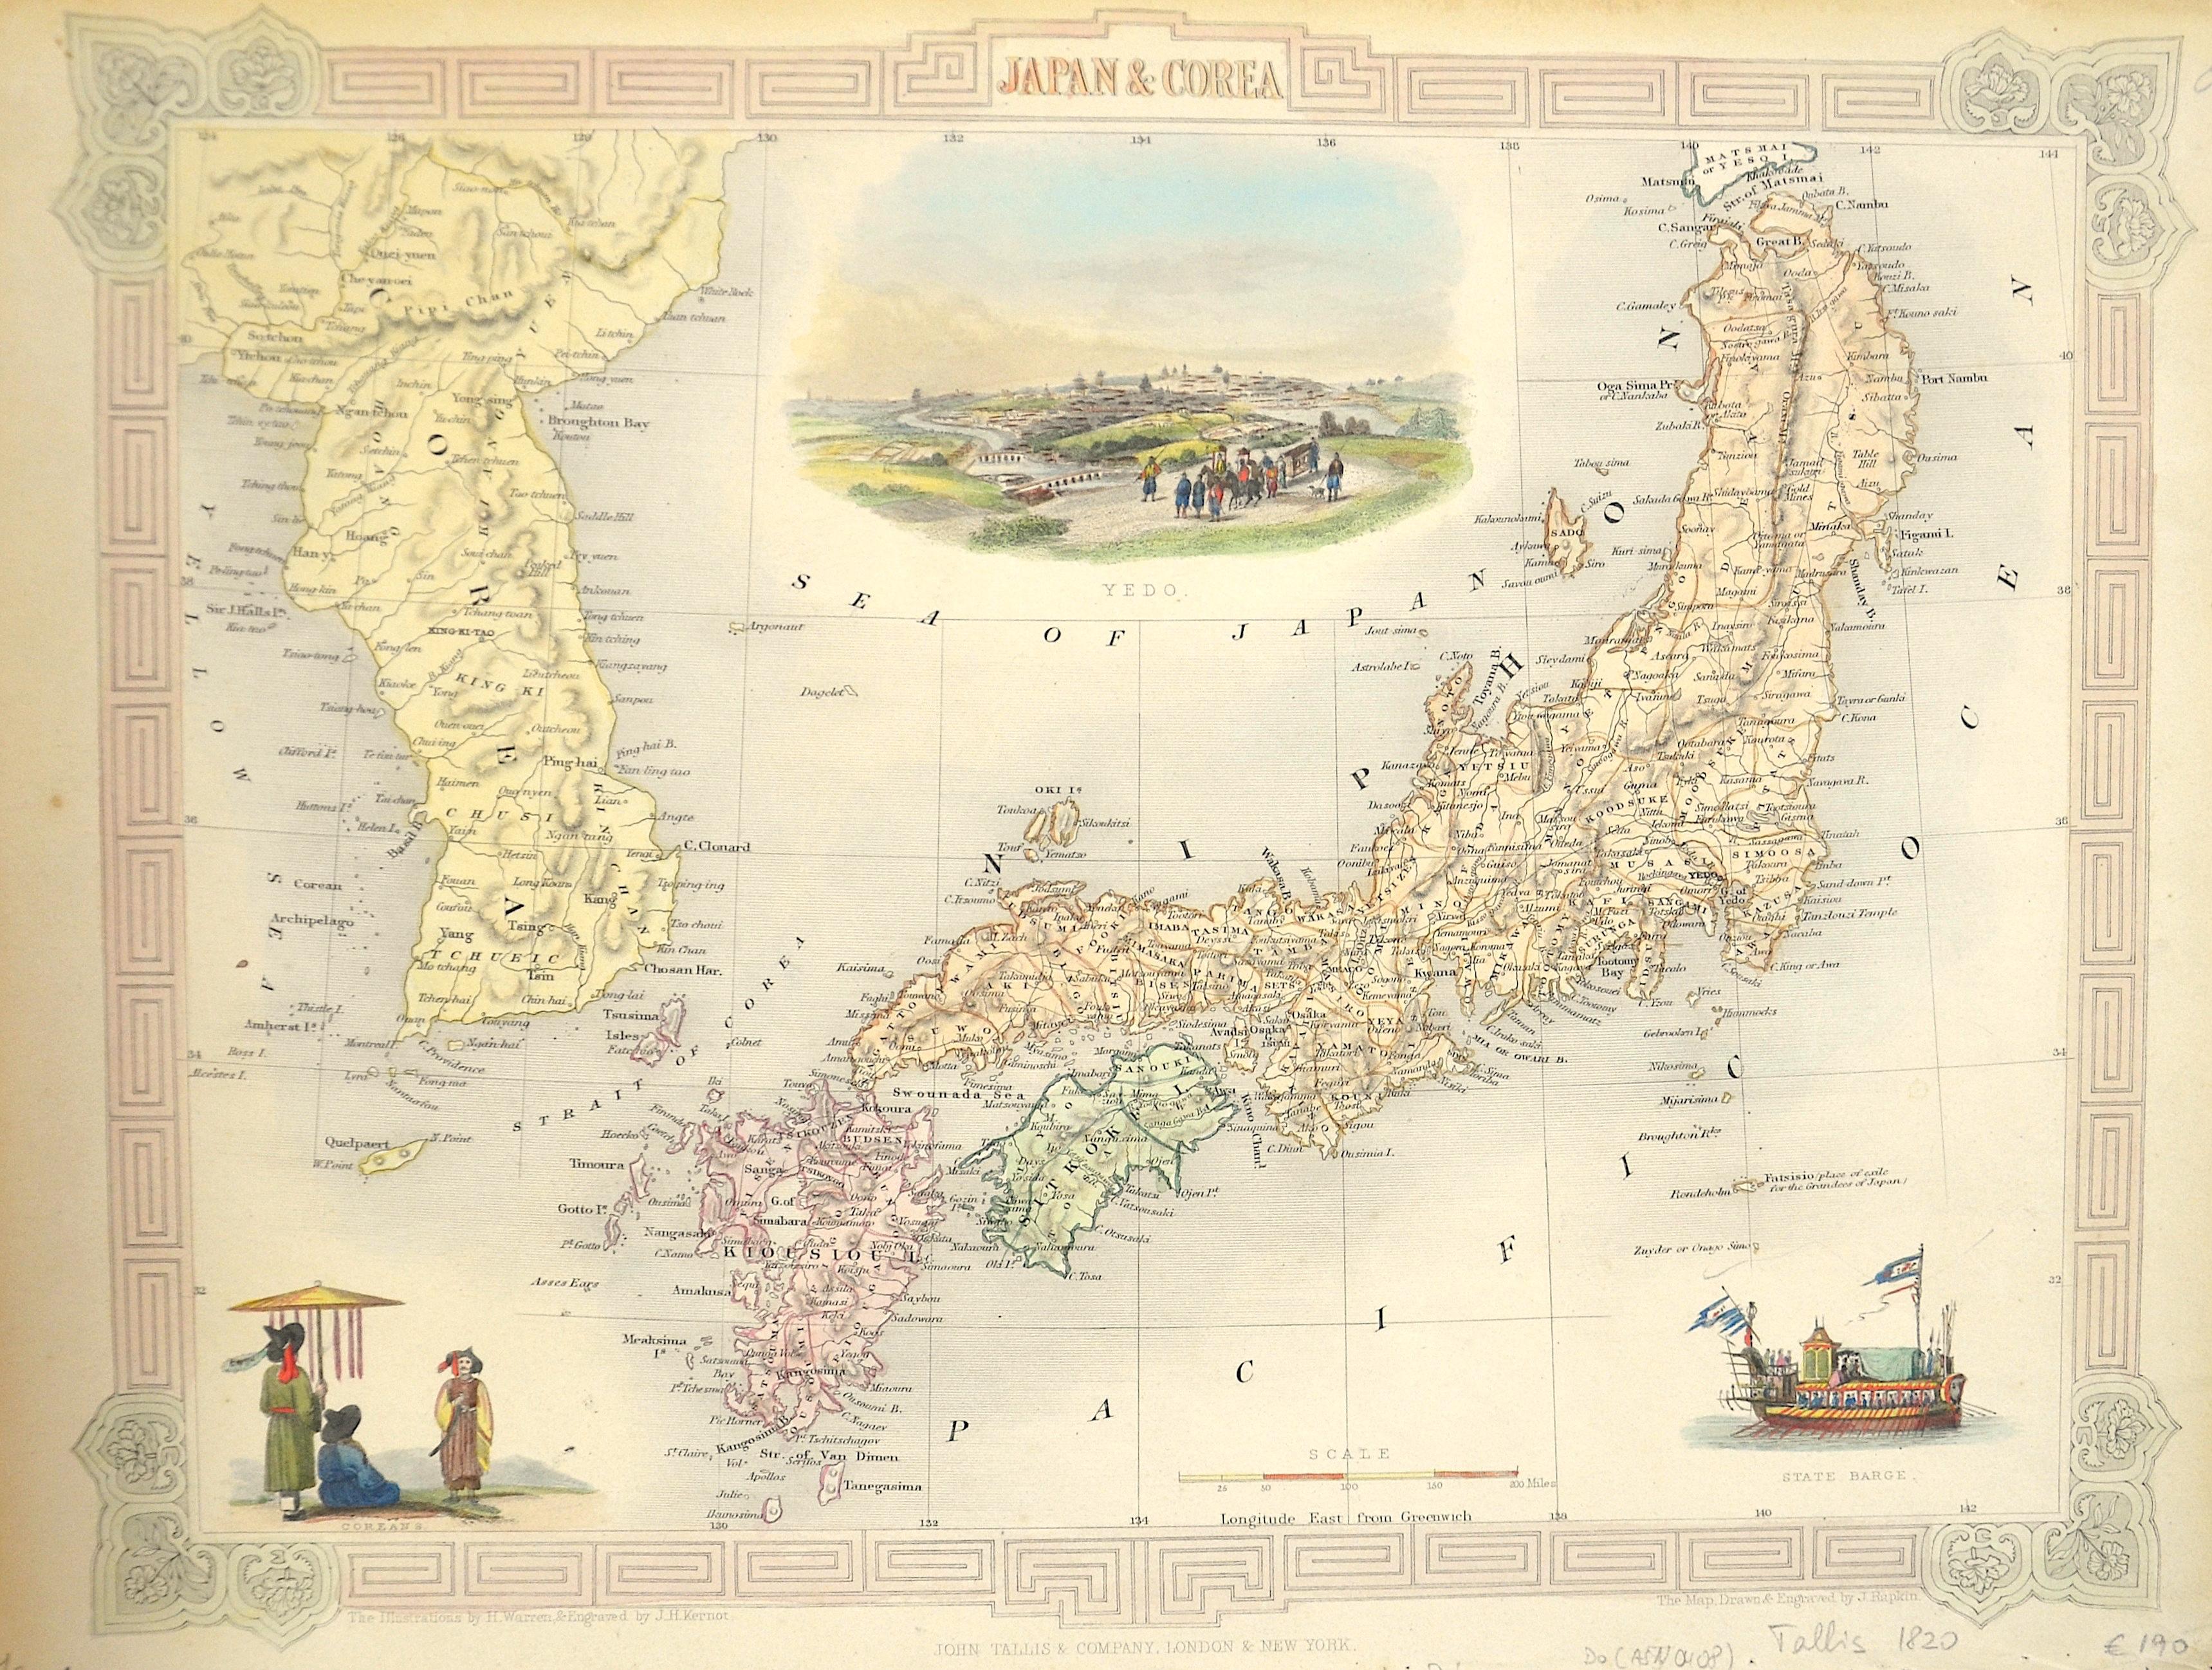 Tallis John Japan & Corea